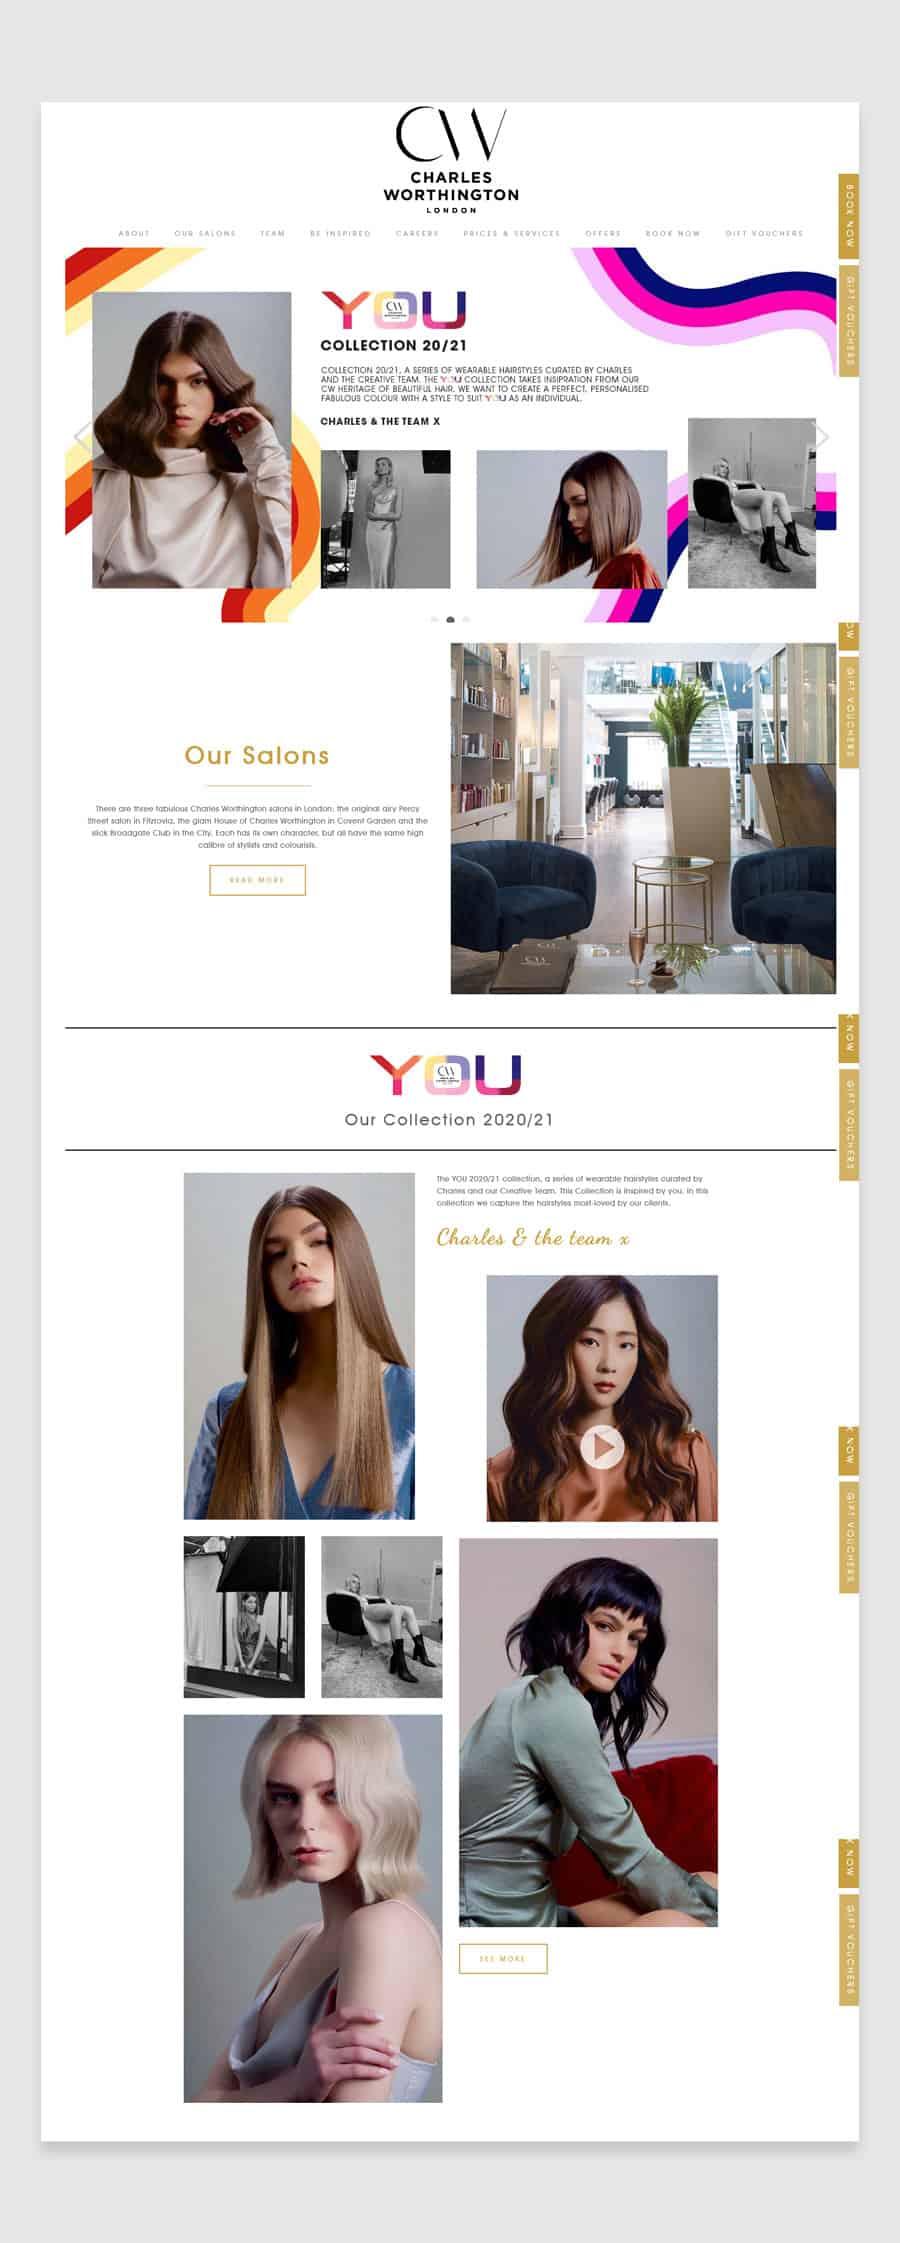 Charles Worthington London Salon - Hair salon website design example